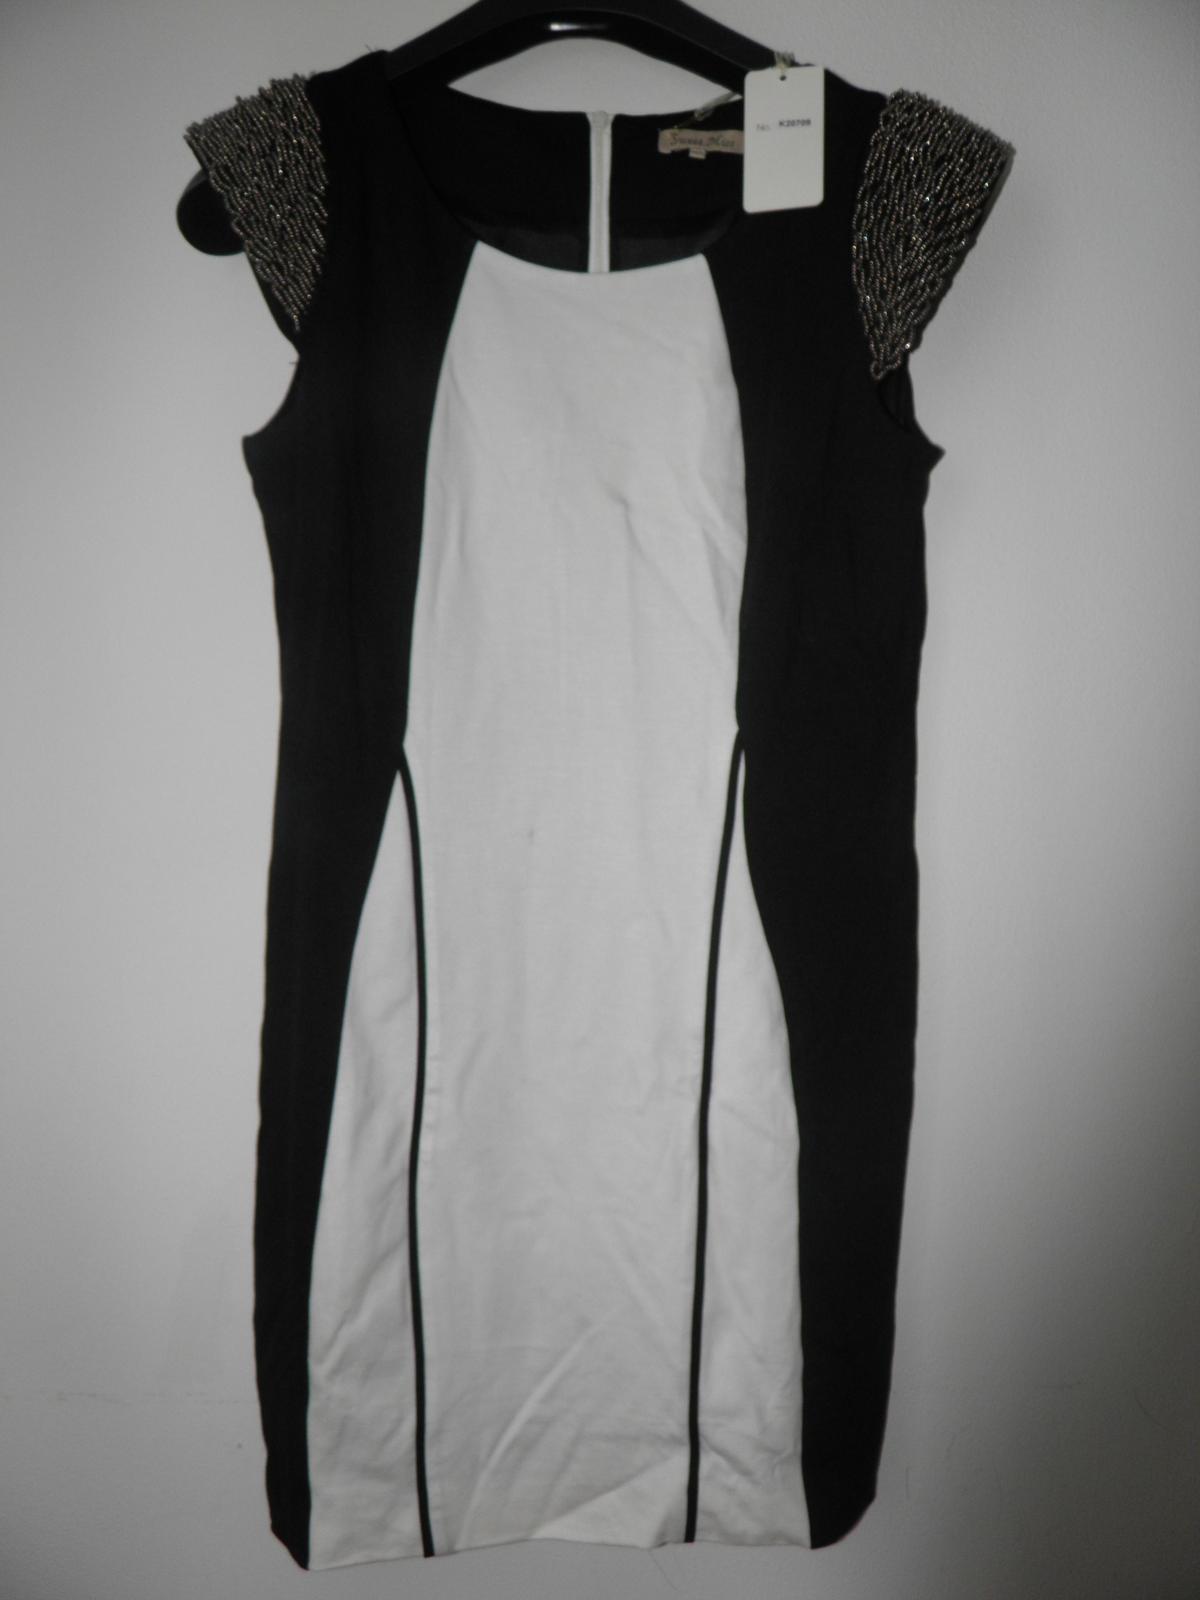 luxusné šaty z butiku, sedia na L/XL - Obrázok č. 2